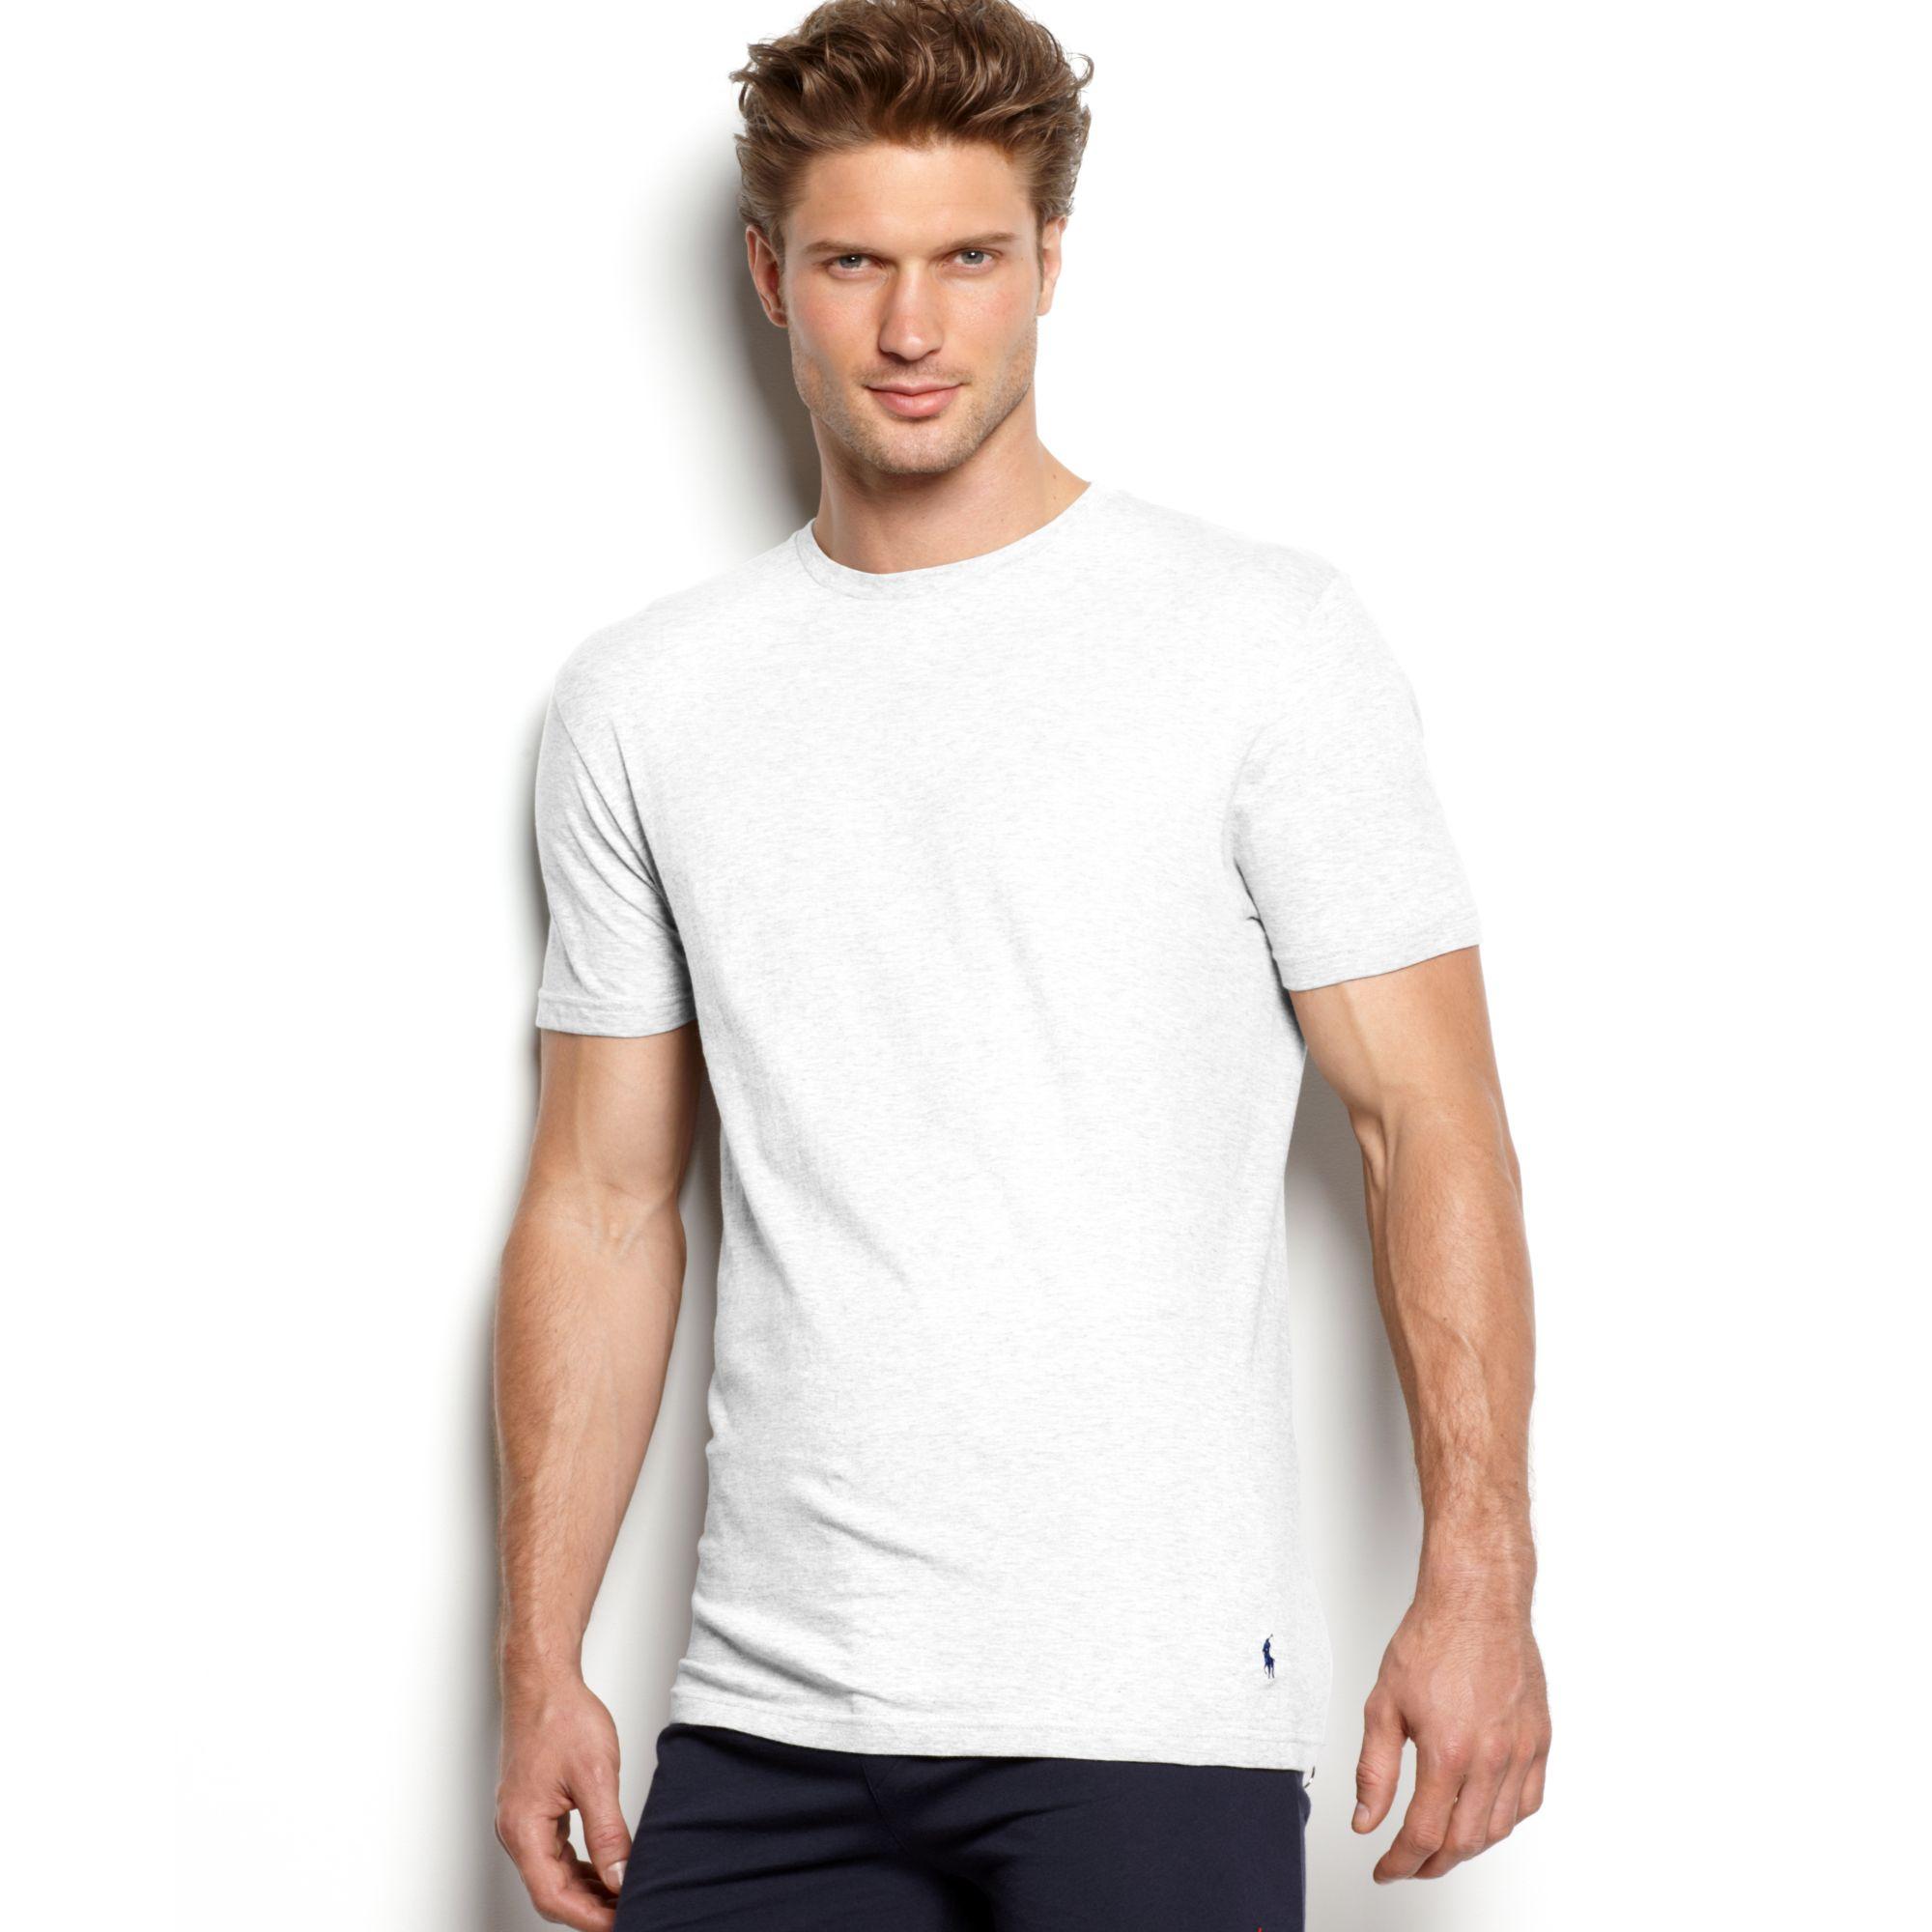 Bedroom Athletics Clothing